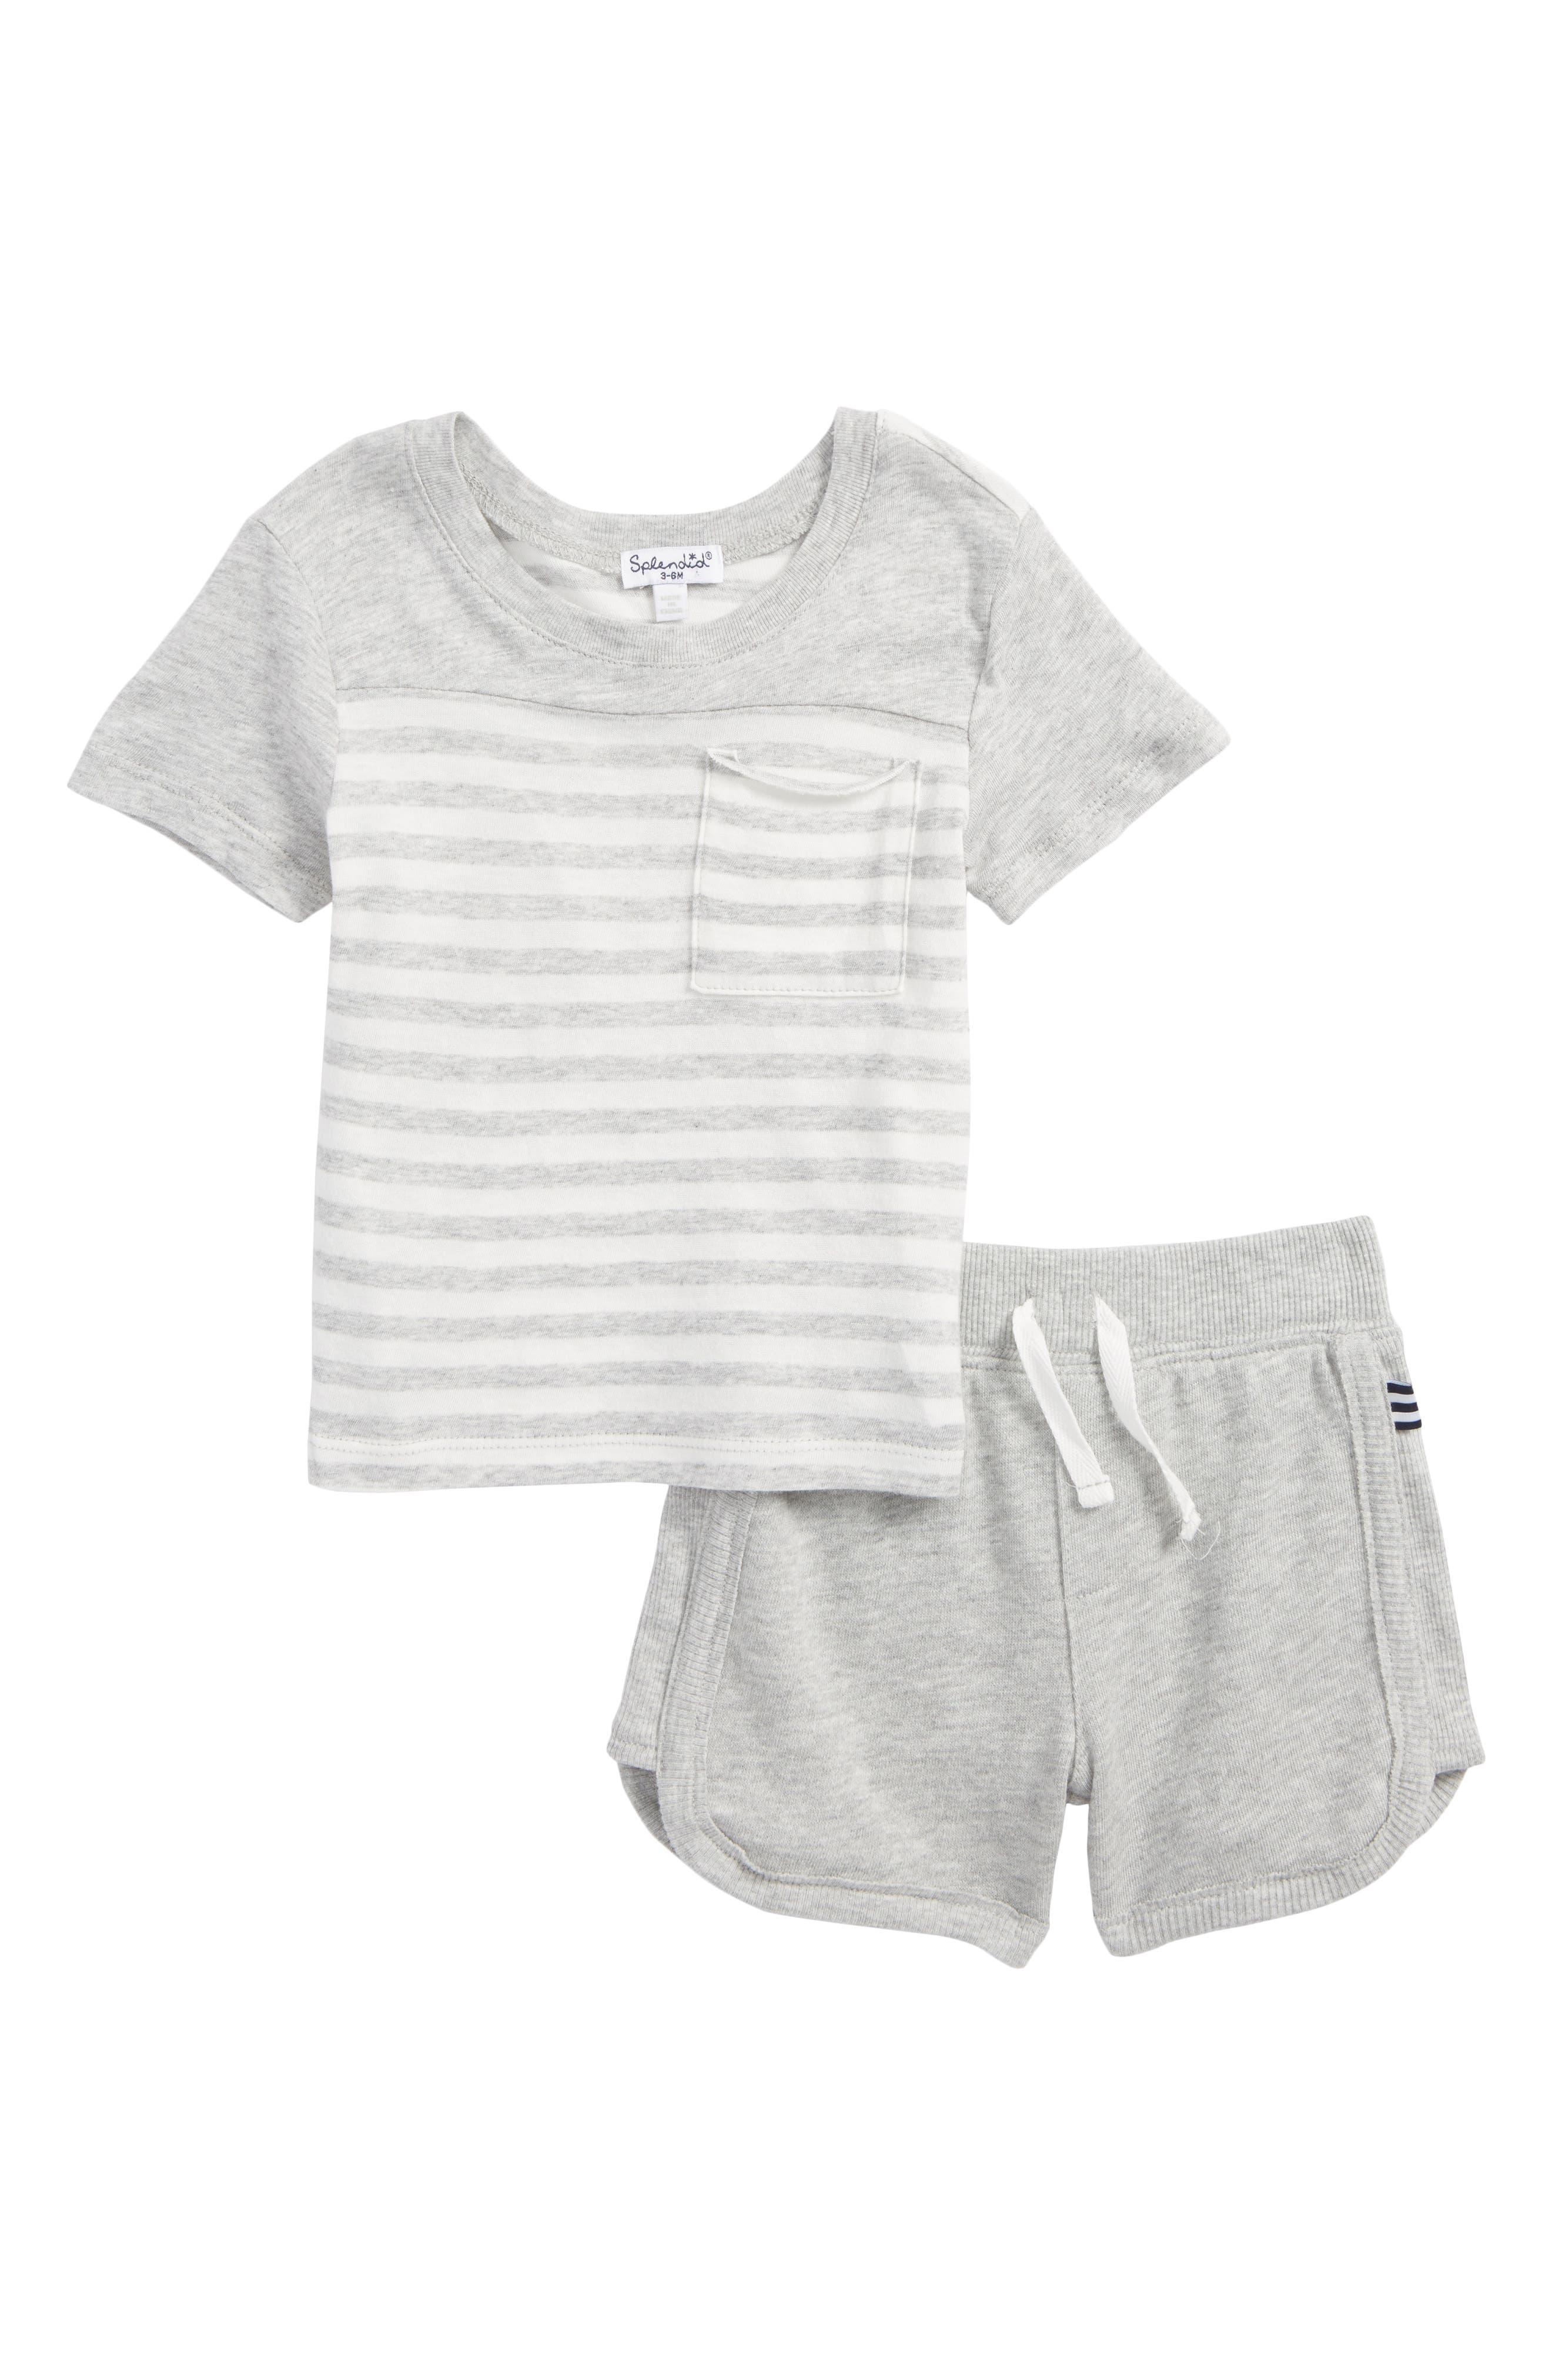 Splendid Pocket T-Shirt & Shorts Set (Baby)